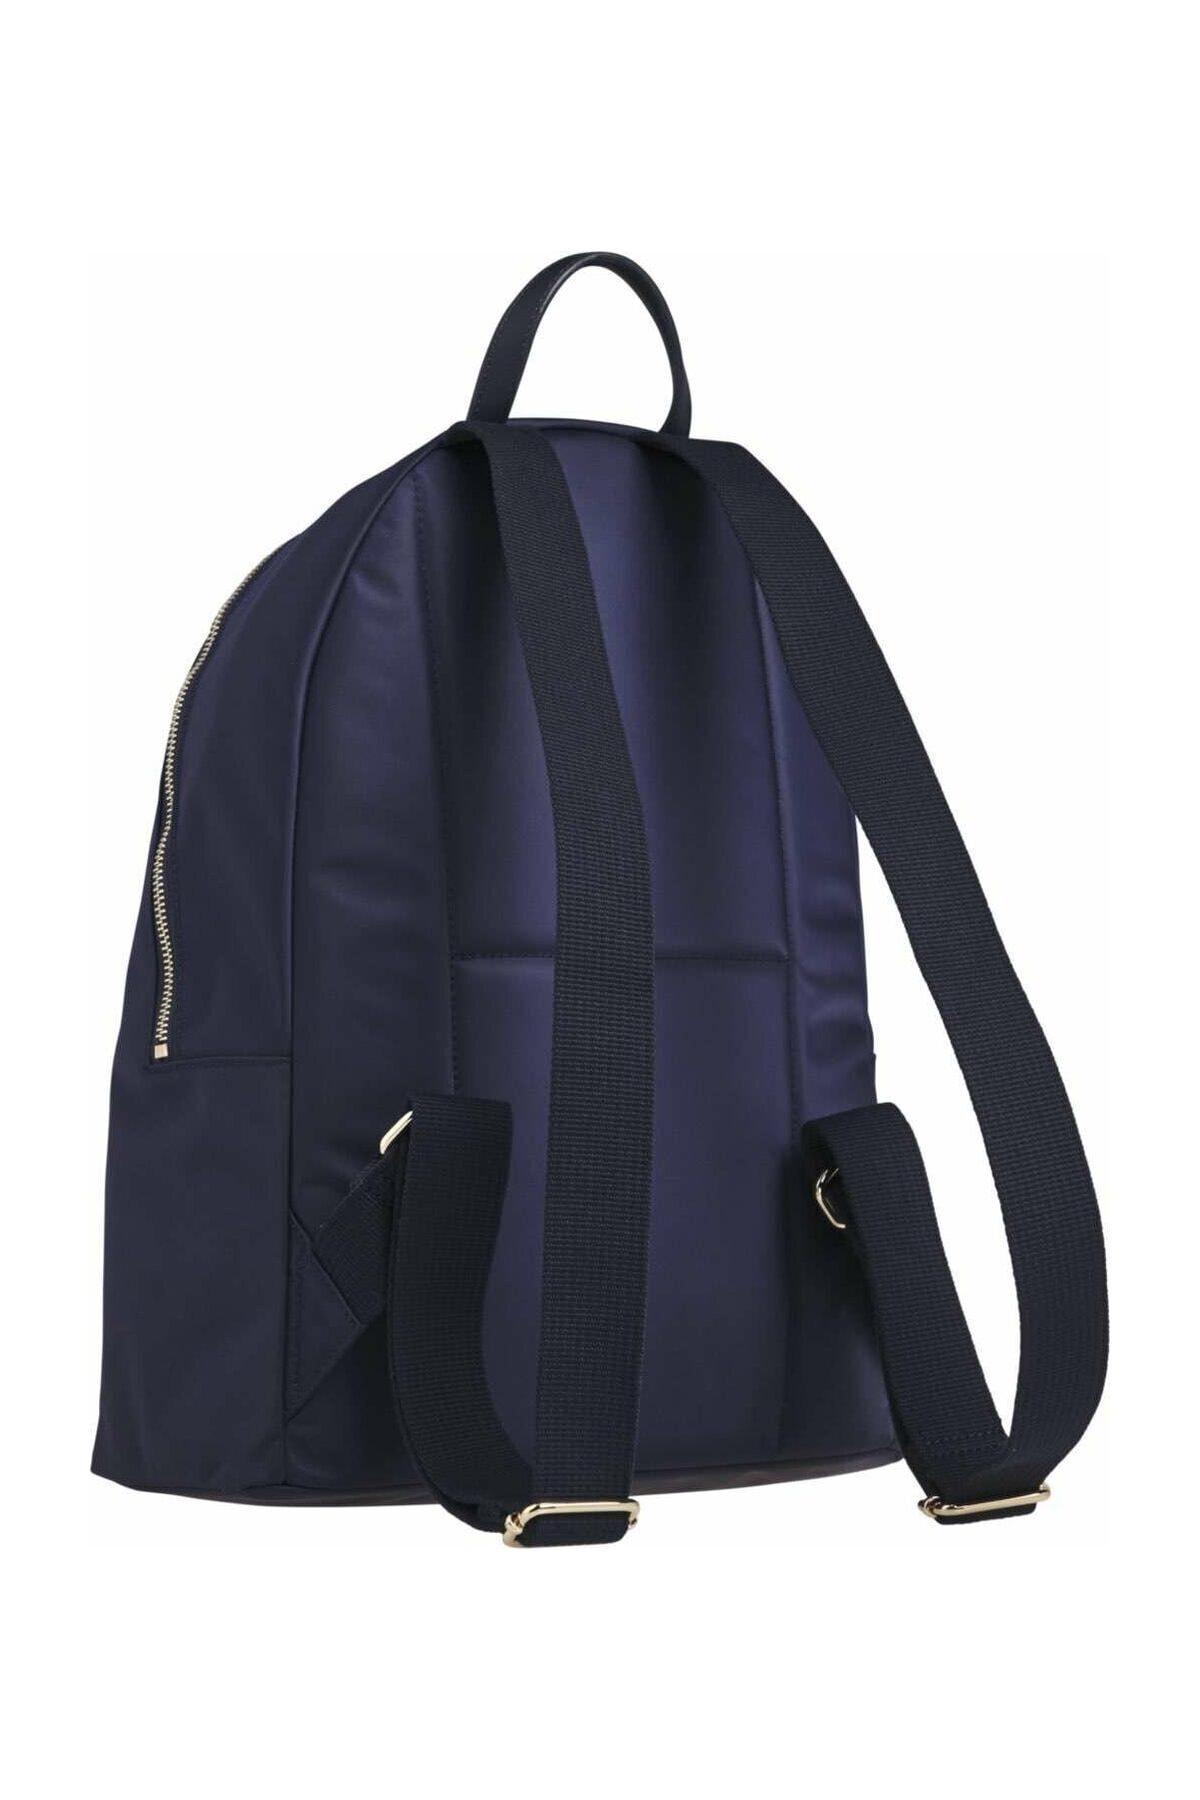 Tommy Hilfiger Kadın Mavi Sırt Çantası Poppy Backpack Corp AW0AW08823 2